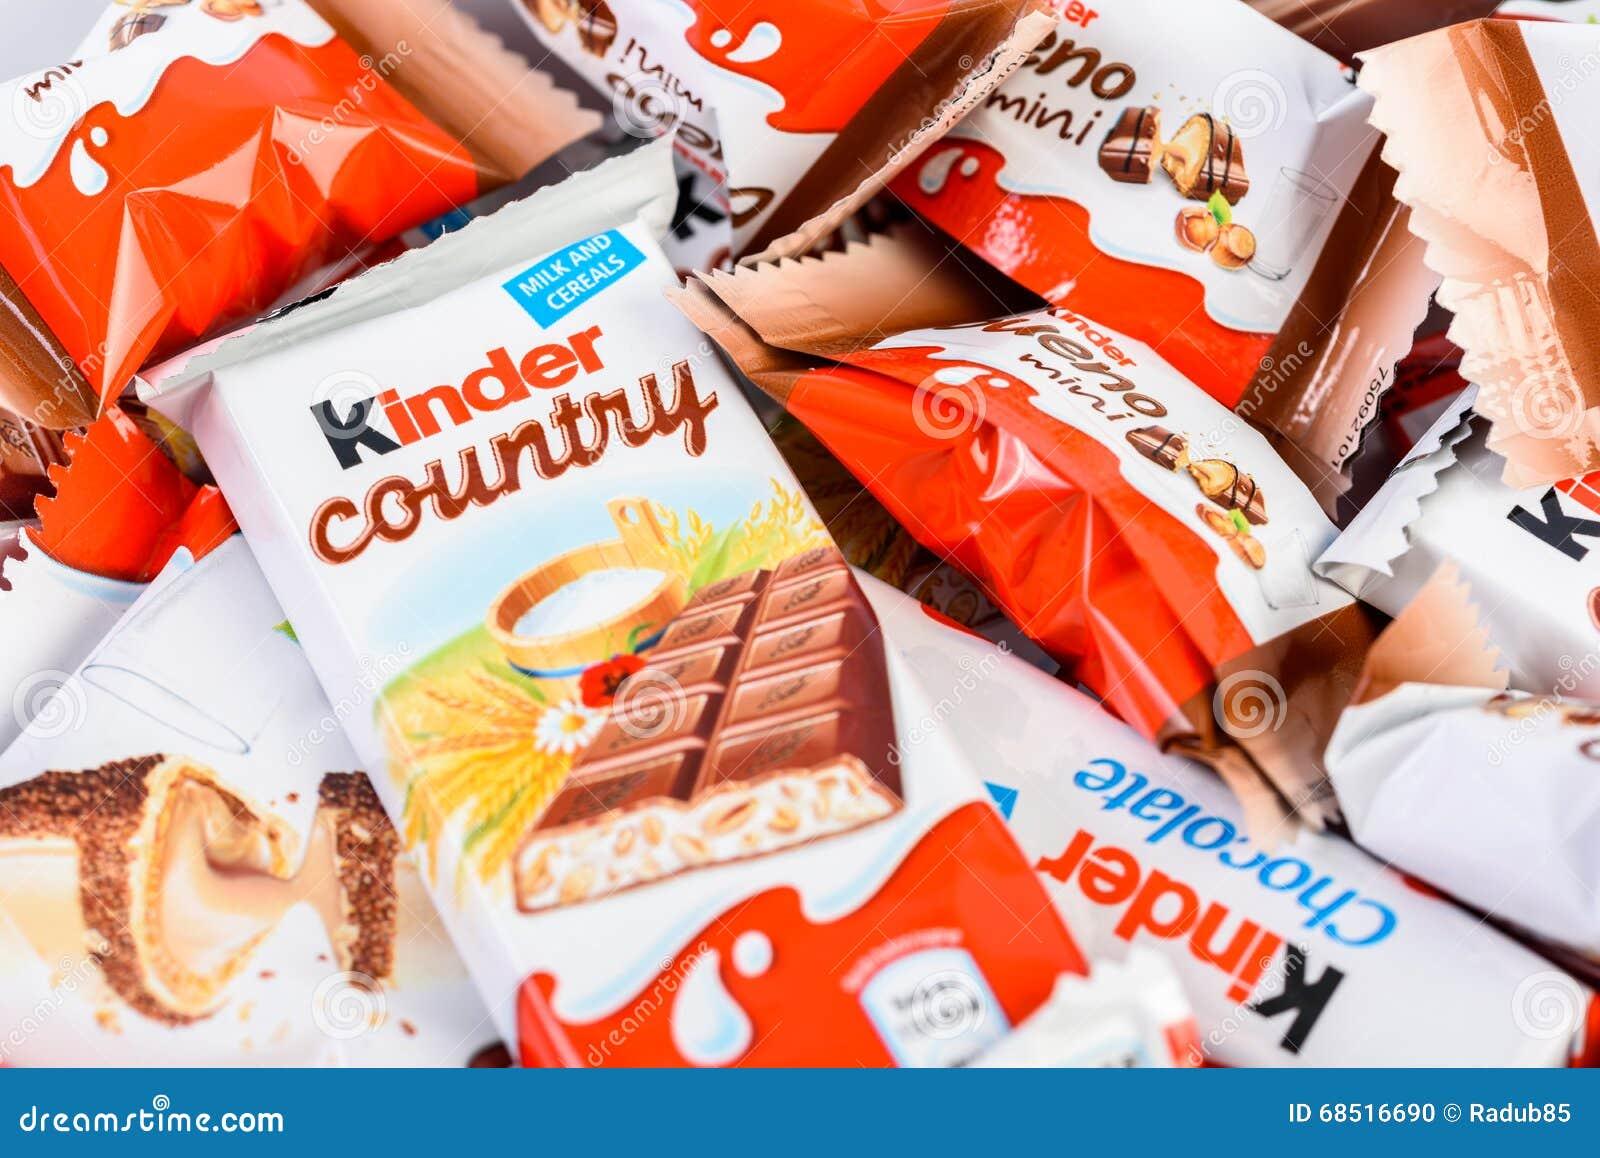 Kinder Chocolate Editorial Photo - Image: 68516686